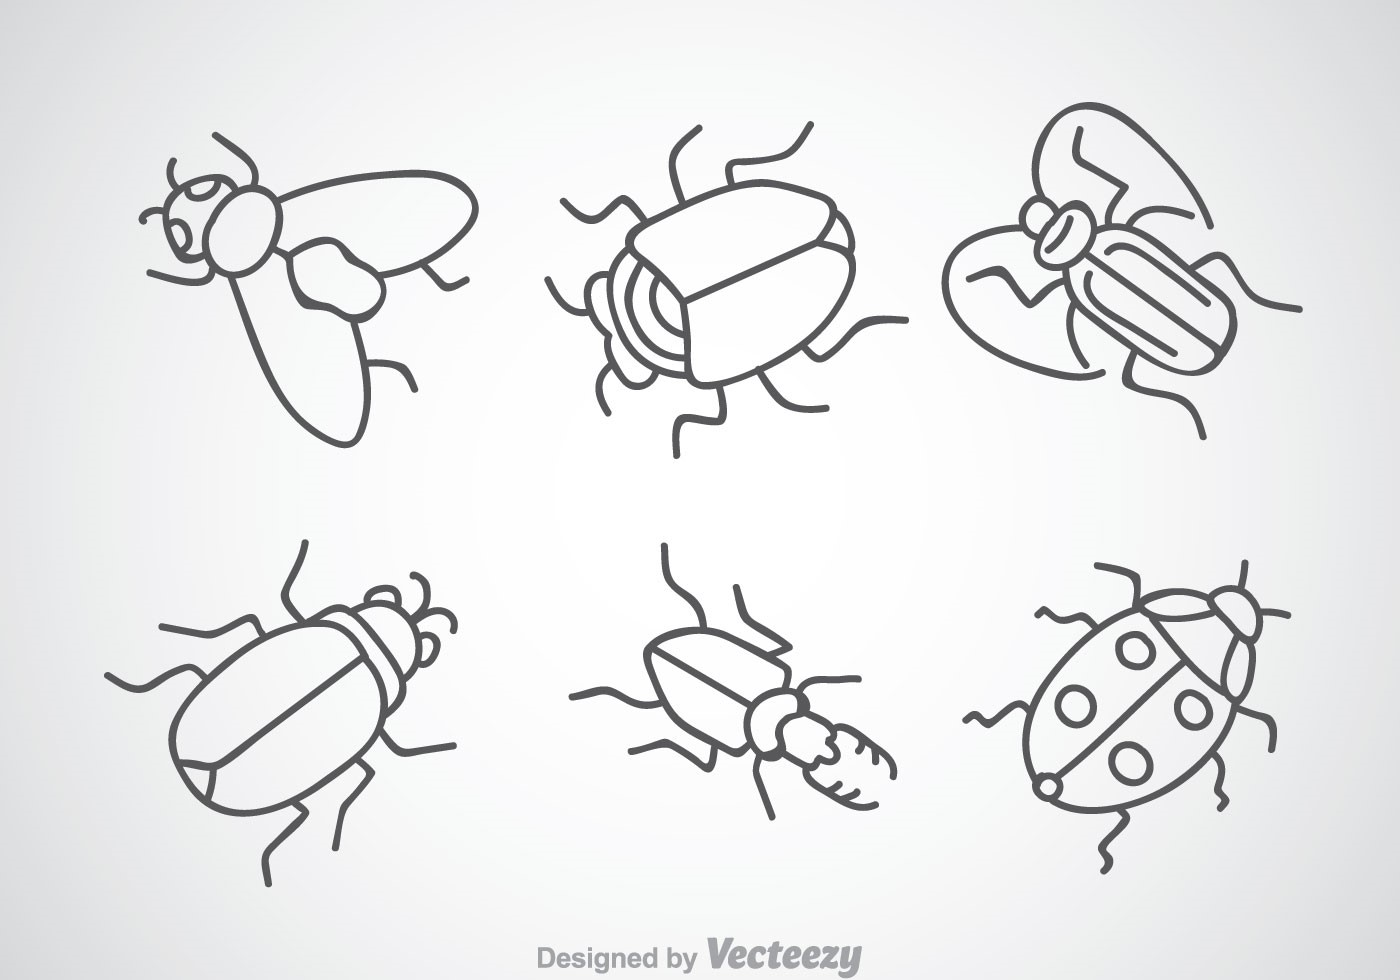 Les répulsifs contre les insectes